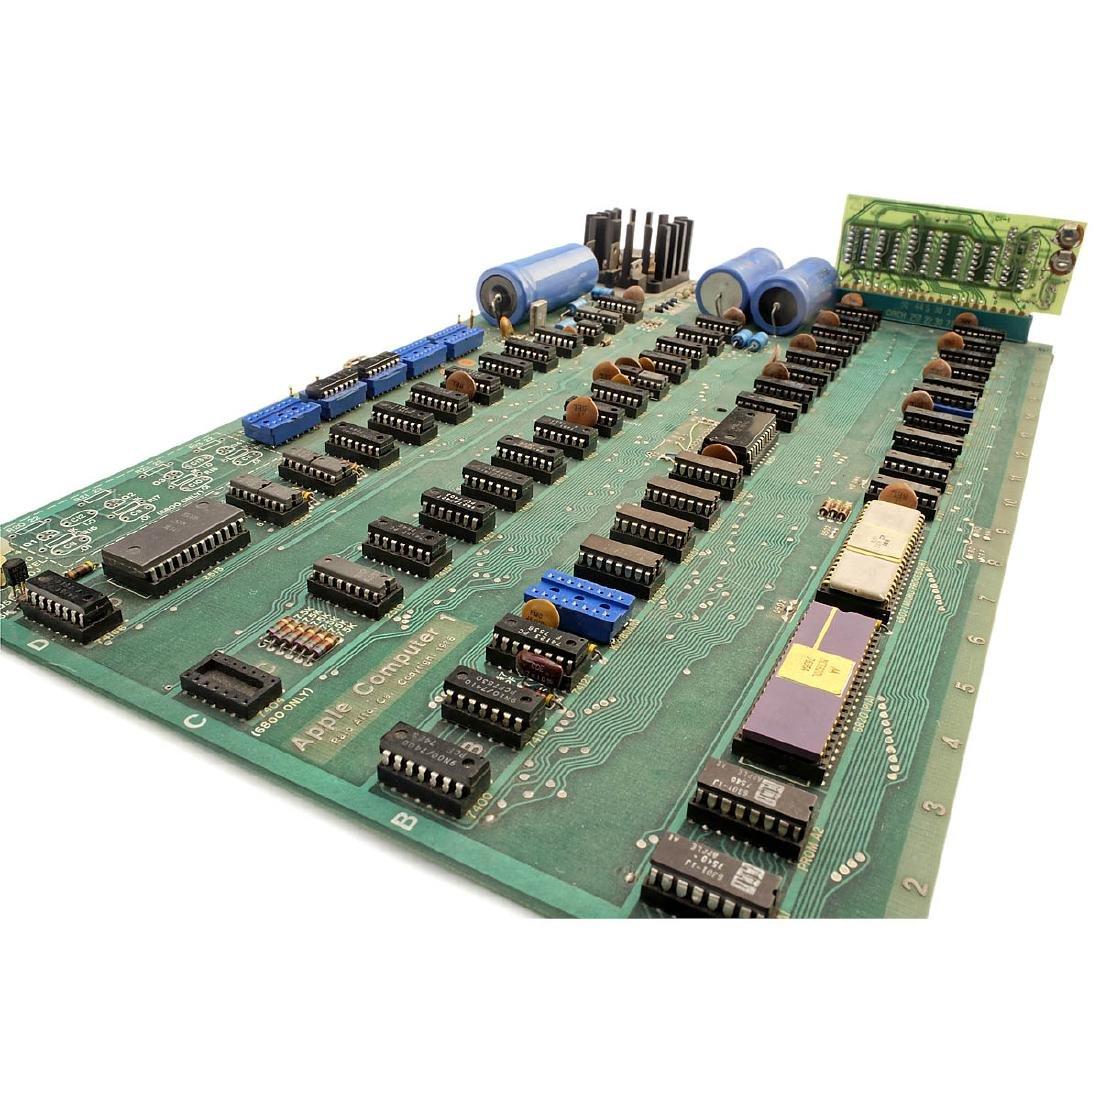 Original Apple-1 Computer, 1976 - 2